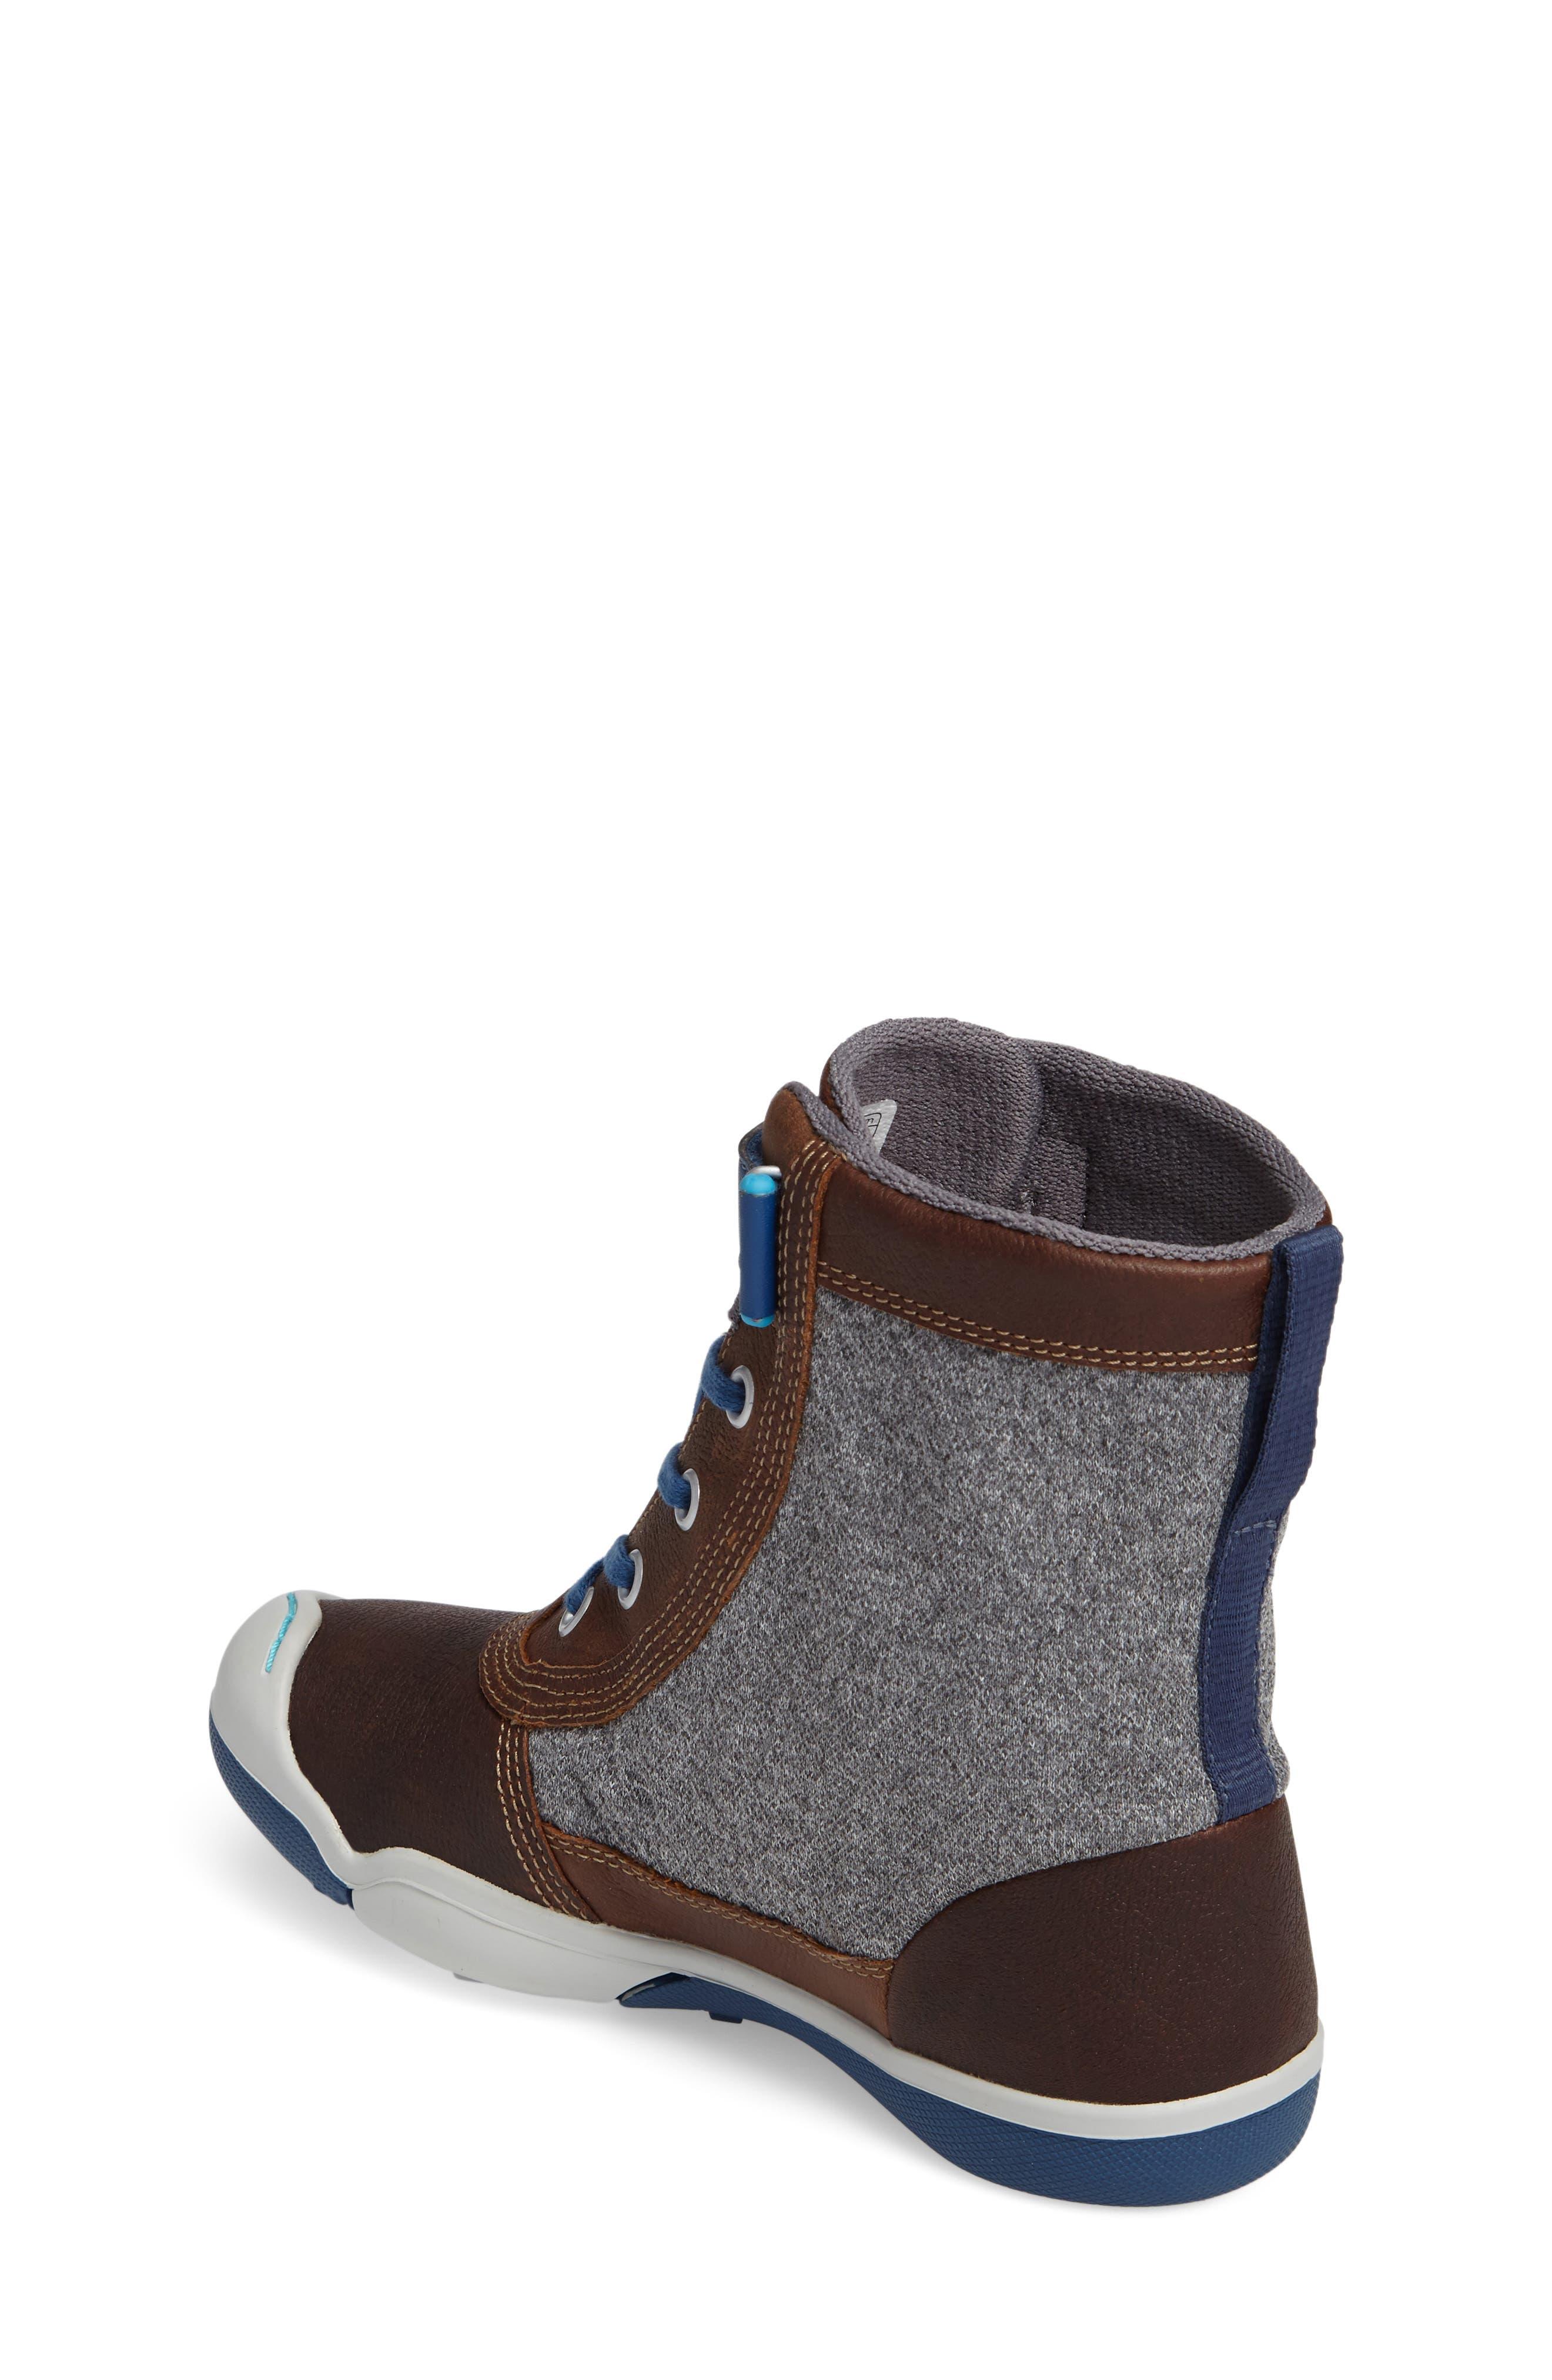 Noel Customizable Boot,                             Alternate thumbnail 2, color,                             214